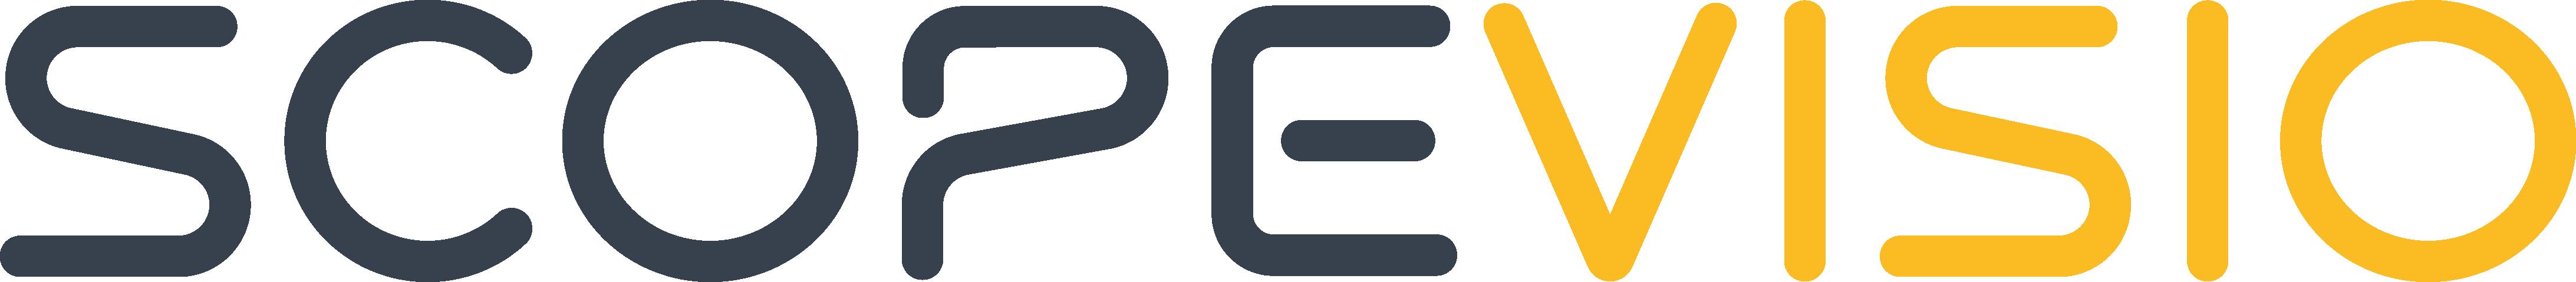 Scopevisio-Bob-digital-digitaler-finanzbuchhalter bob digital